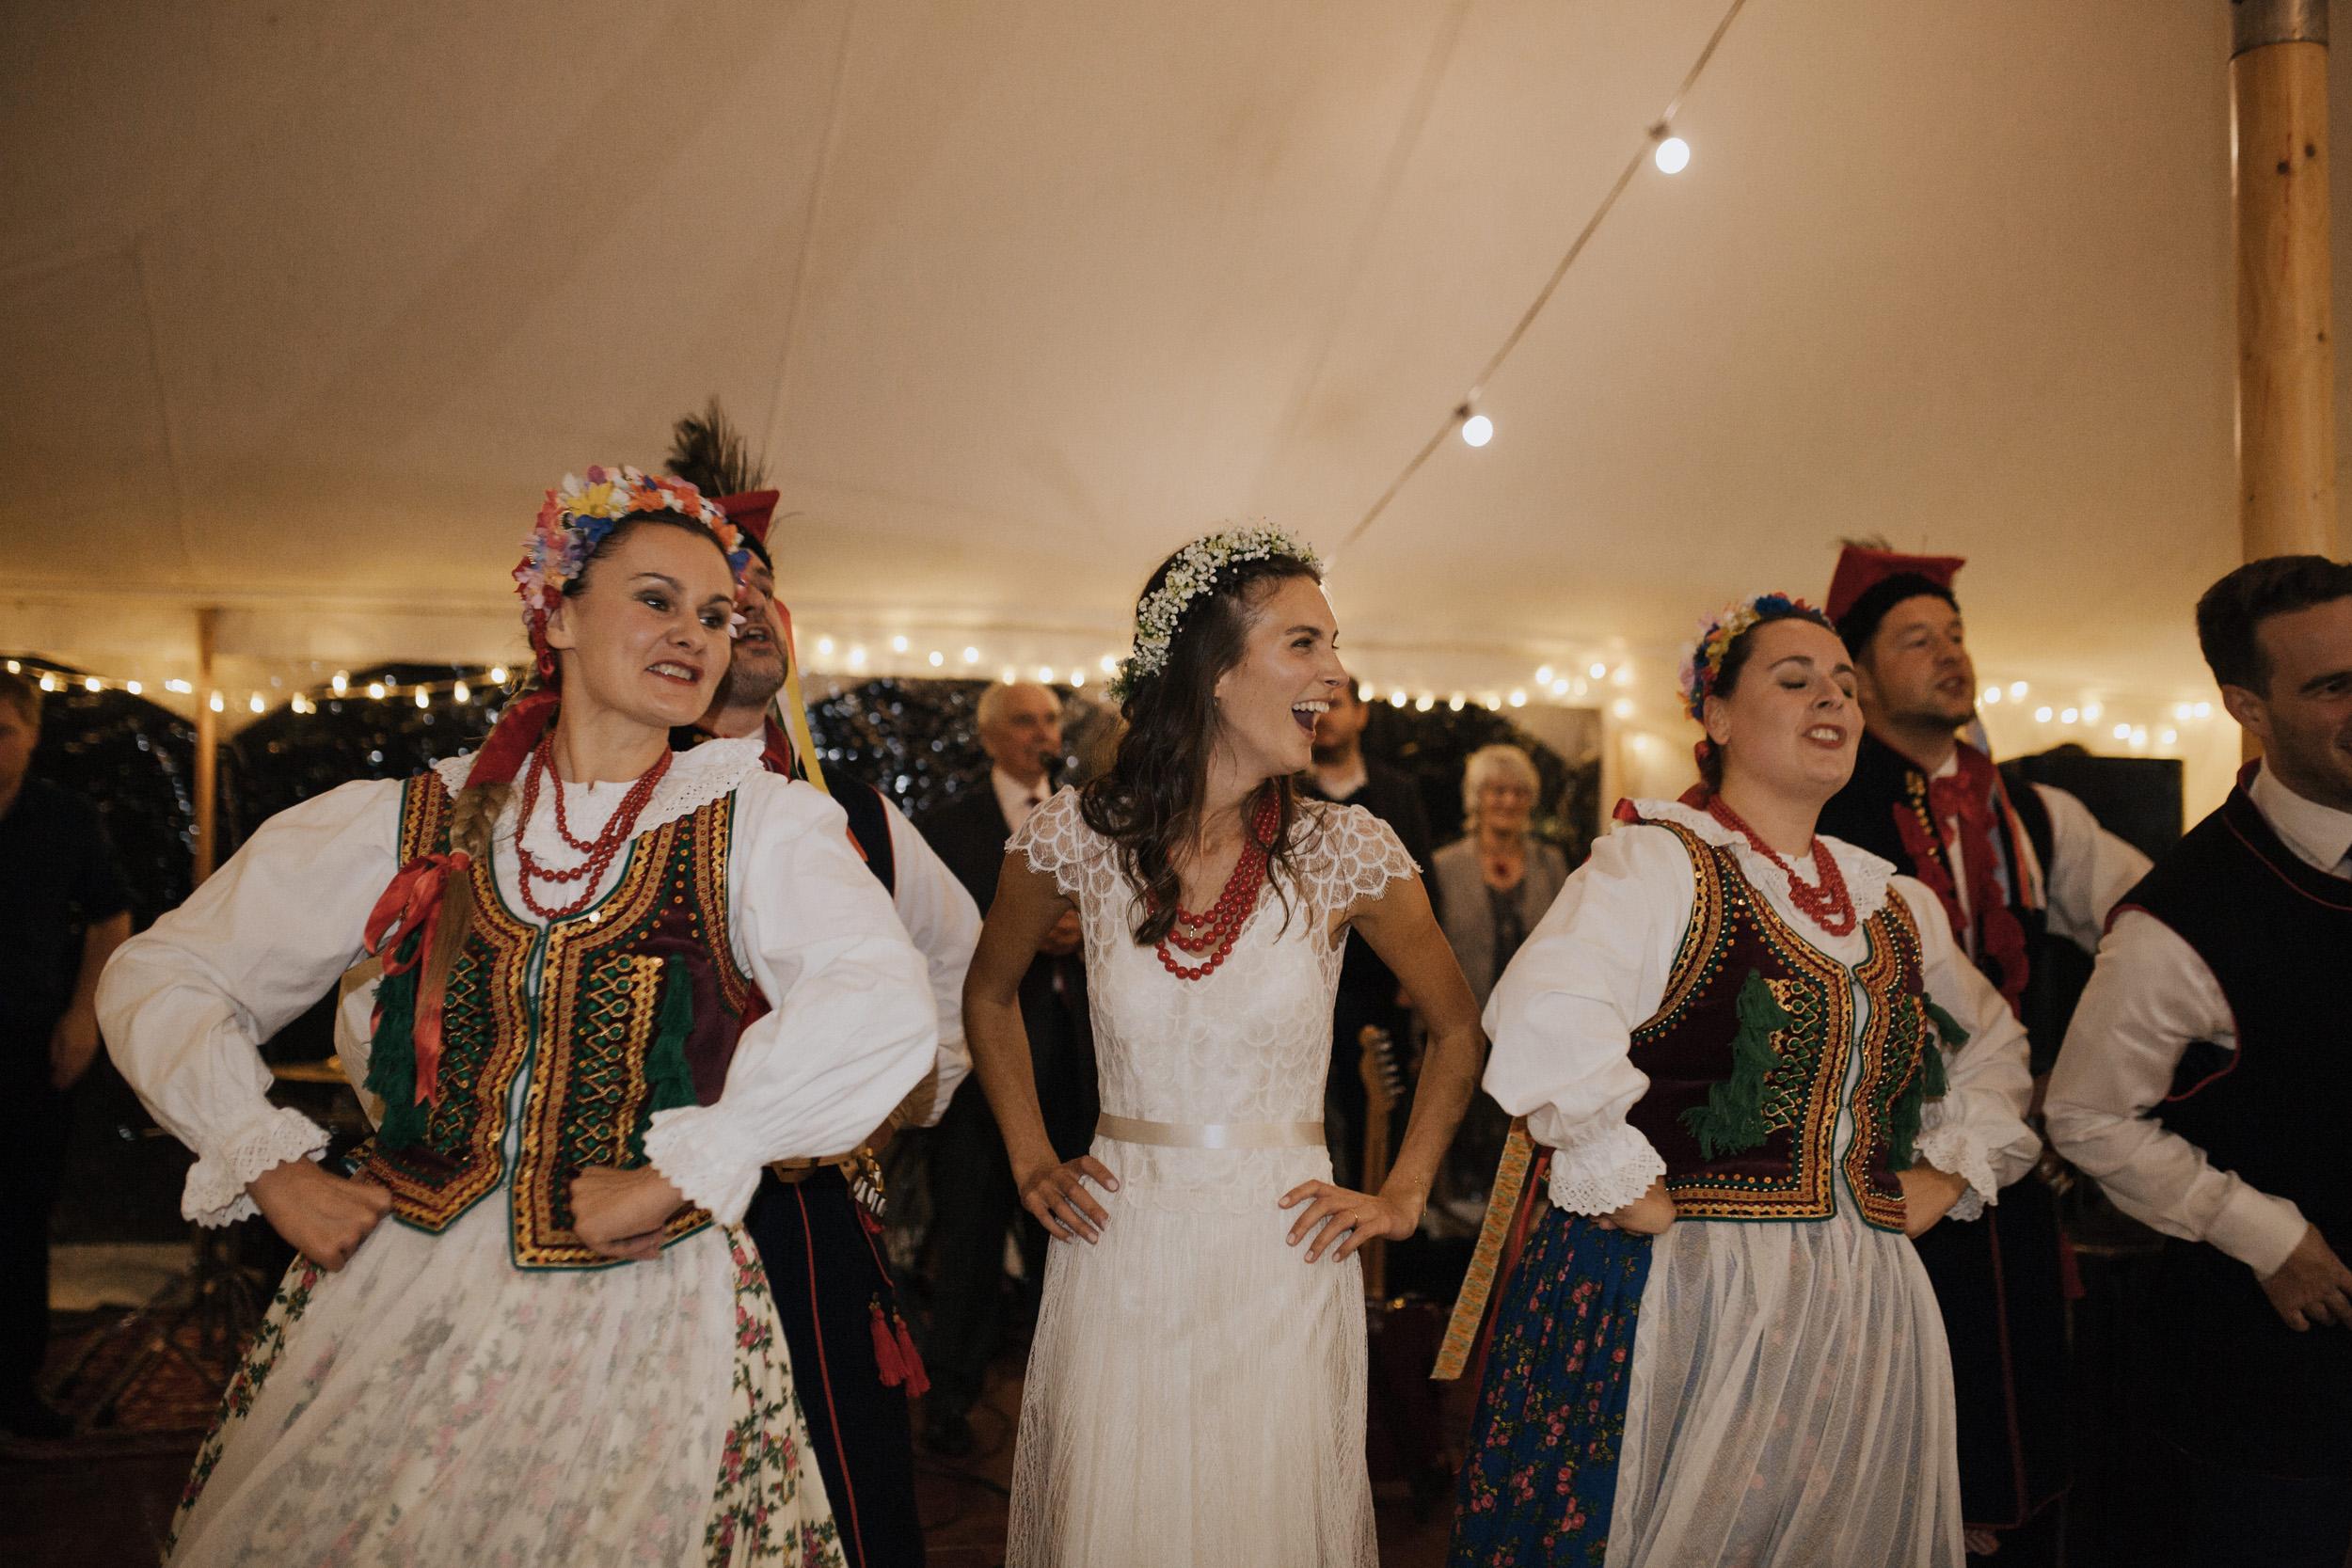 Joasia-Kate-Beaumont-Bohemian-Lace-Wedding-Dress-Peak-District-Sheffield-Wedding-57.jpg